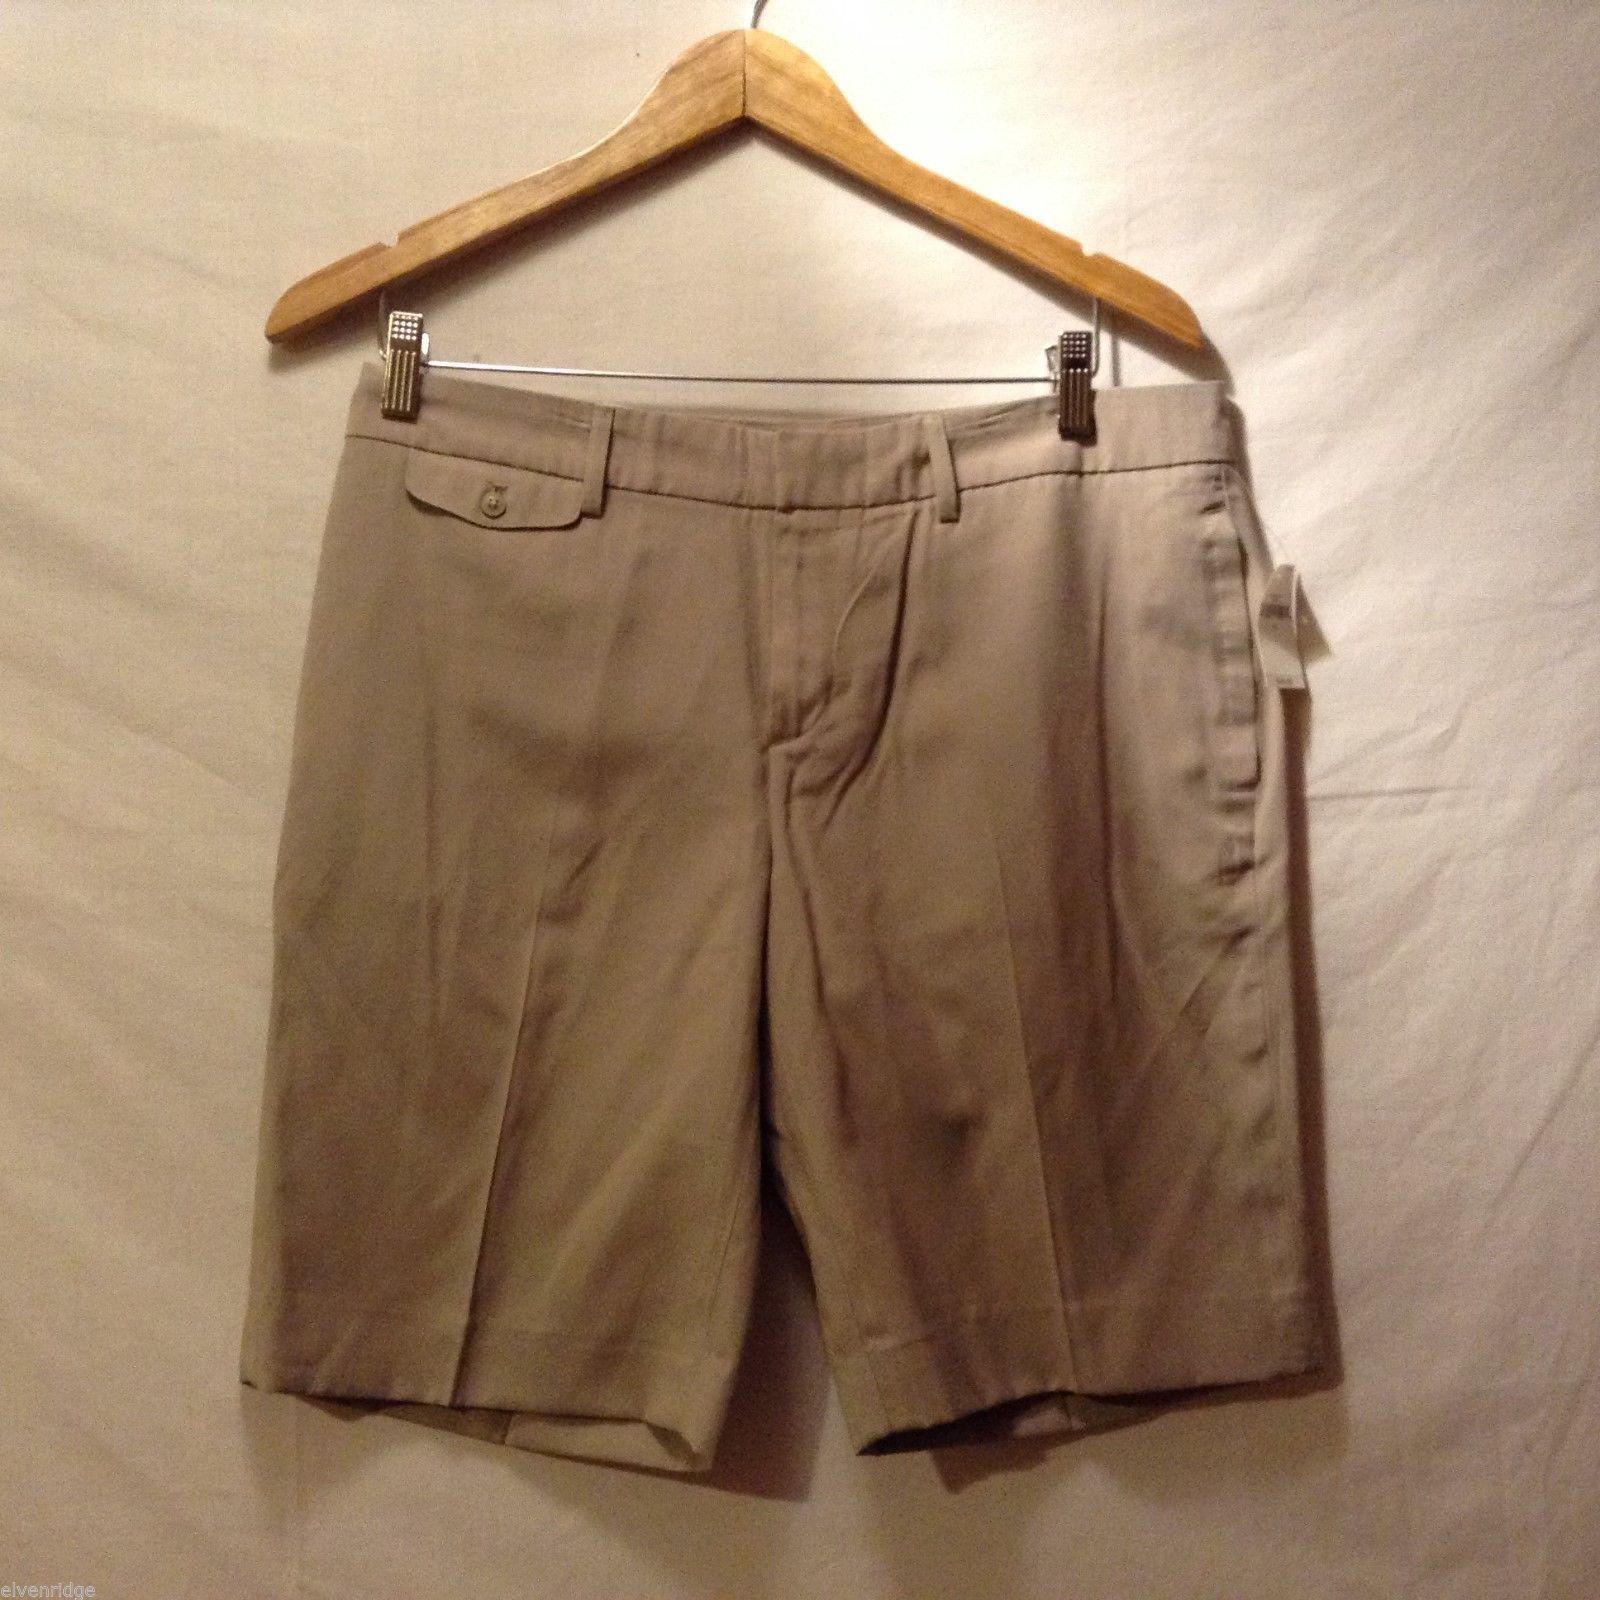 GAP Womans, Tan City Shorts, Size 6